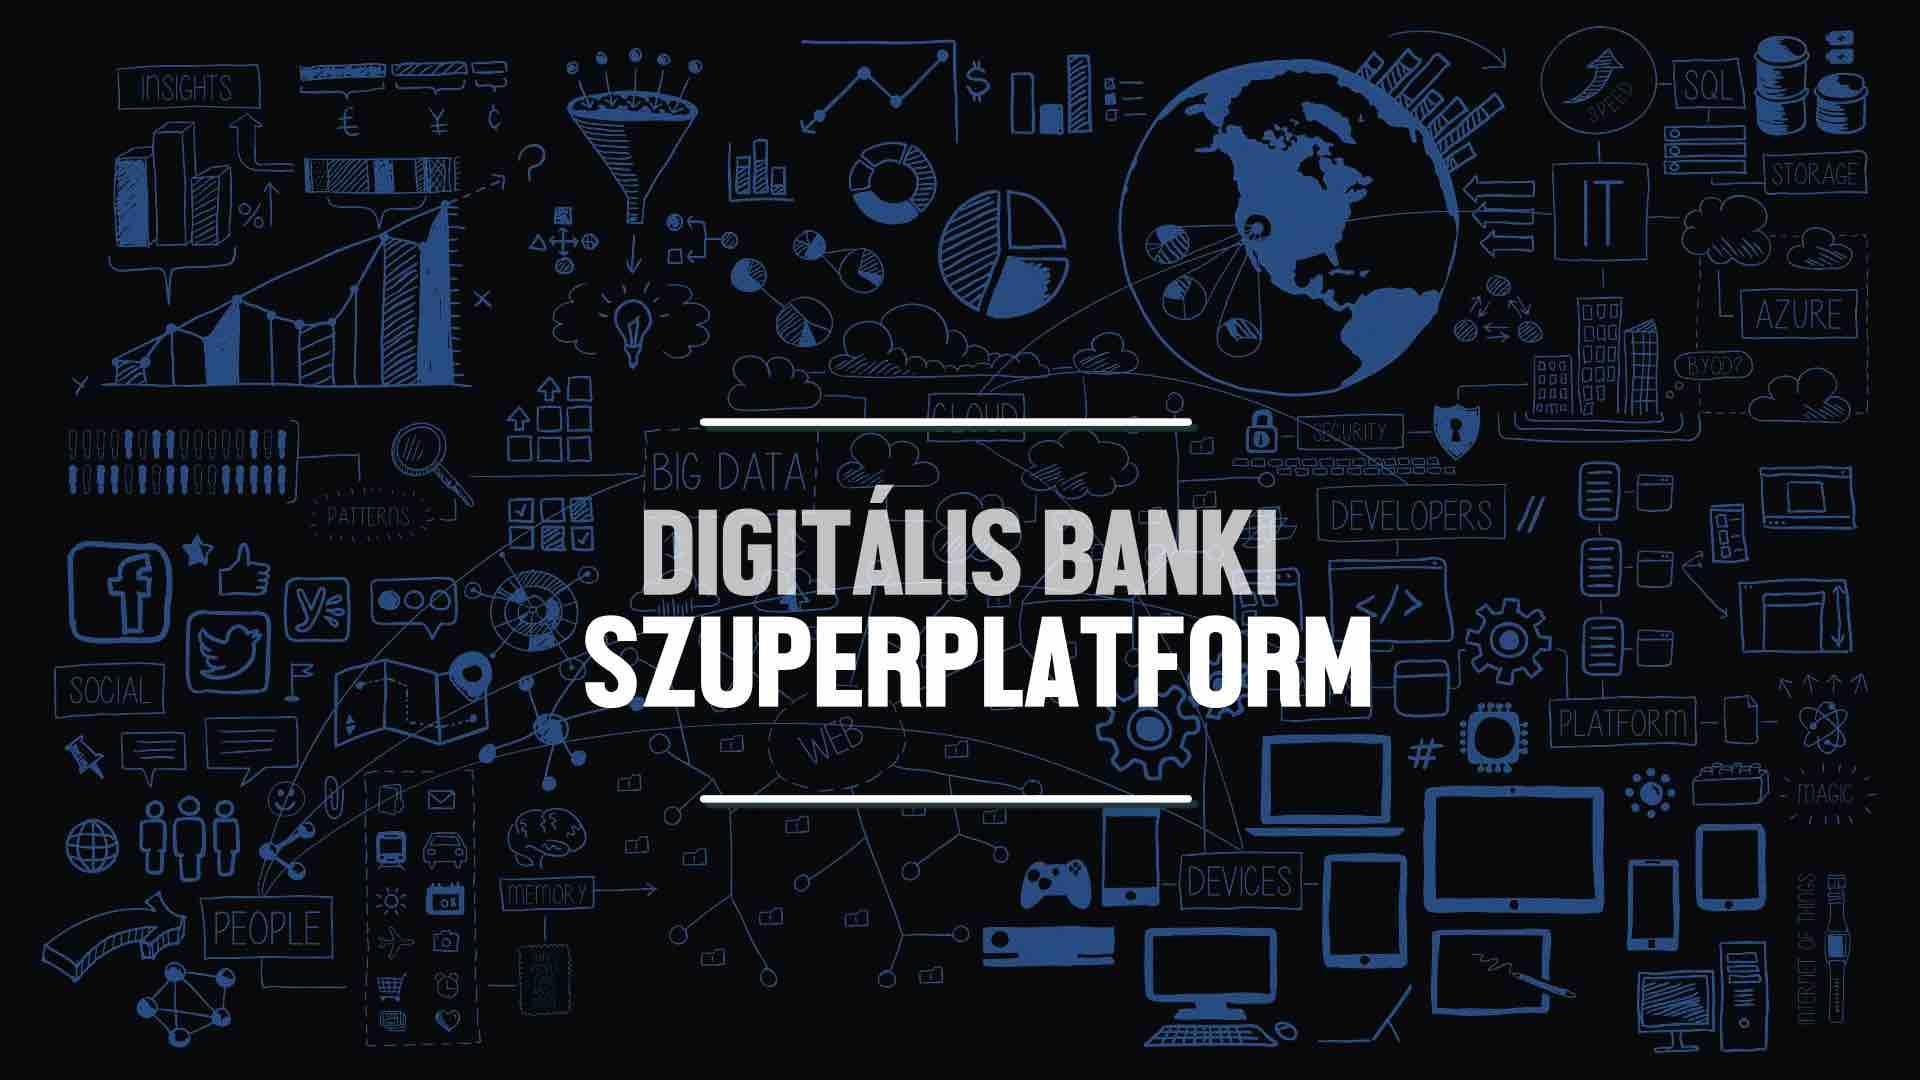 banki adatvagyon szuperplatform PSD2 GDPR